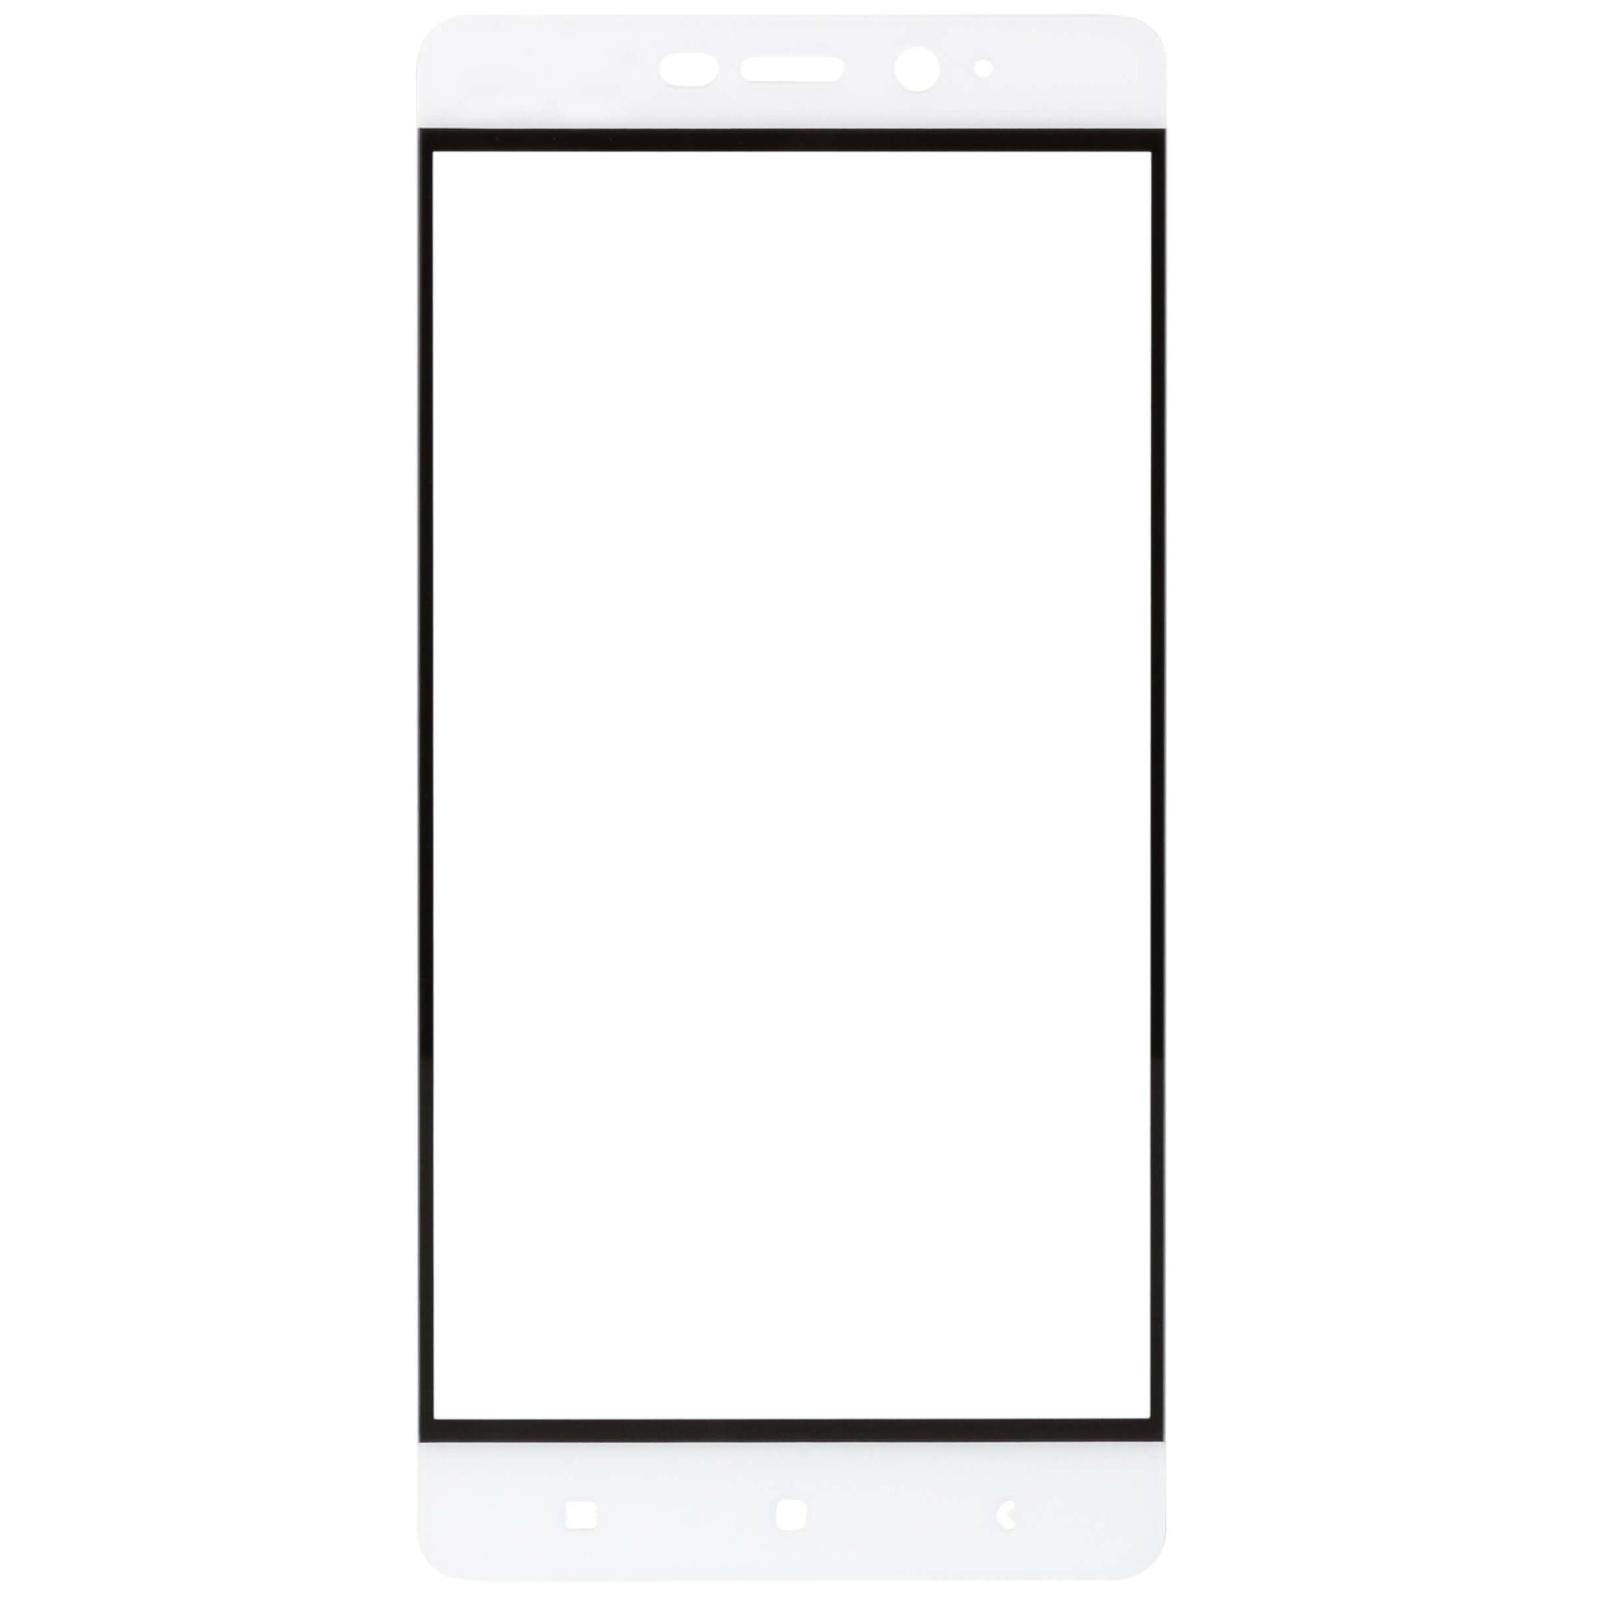 Стекло защитное MakeFuture для Xiaomi Redmi 4 Prime White Full Cover (MGFC-XR4PW) изображение 2